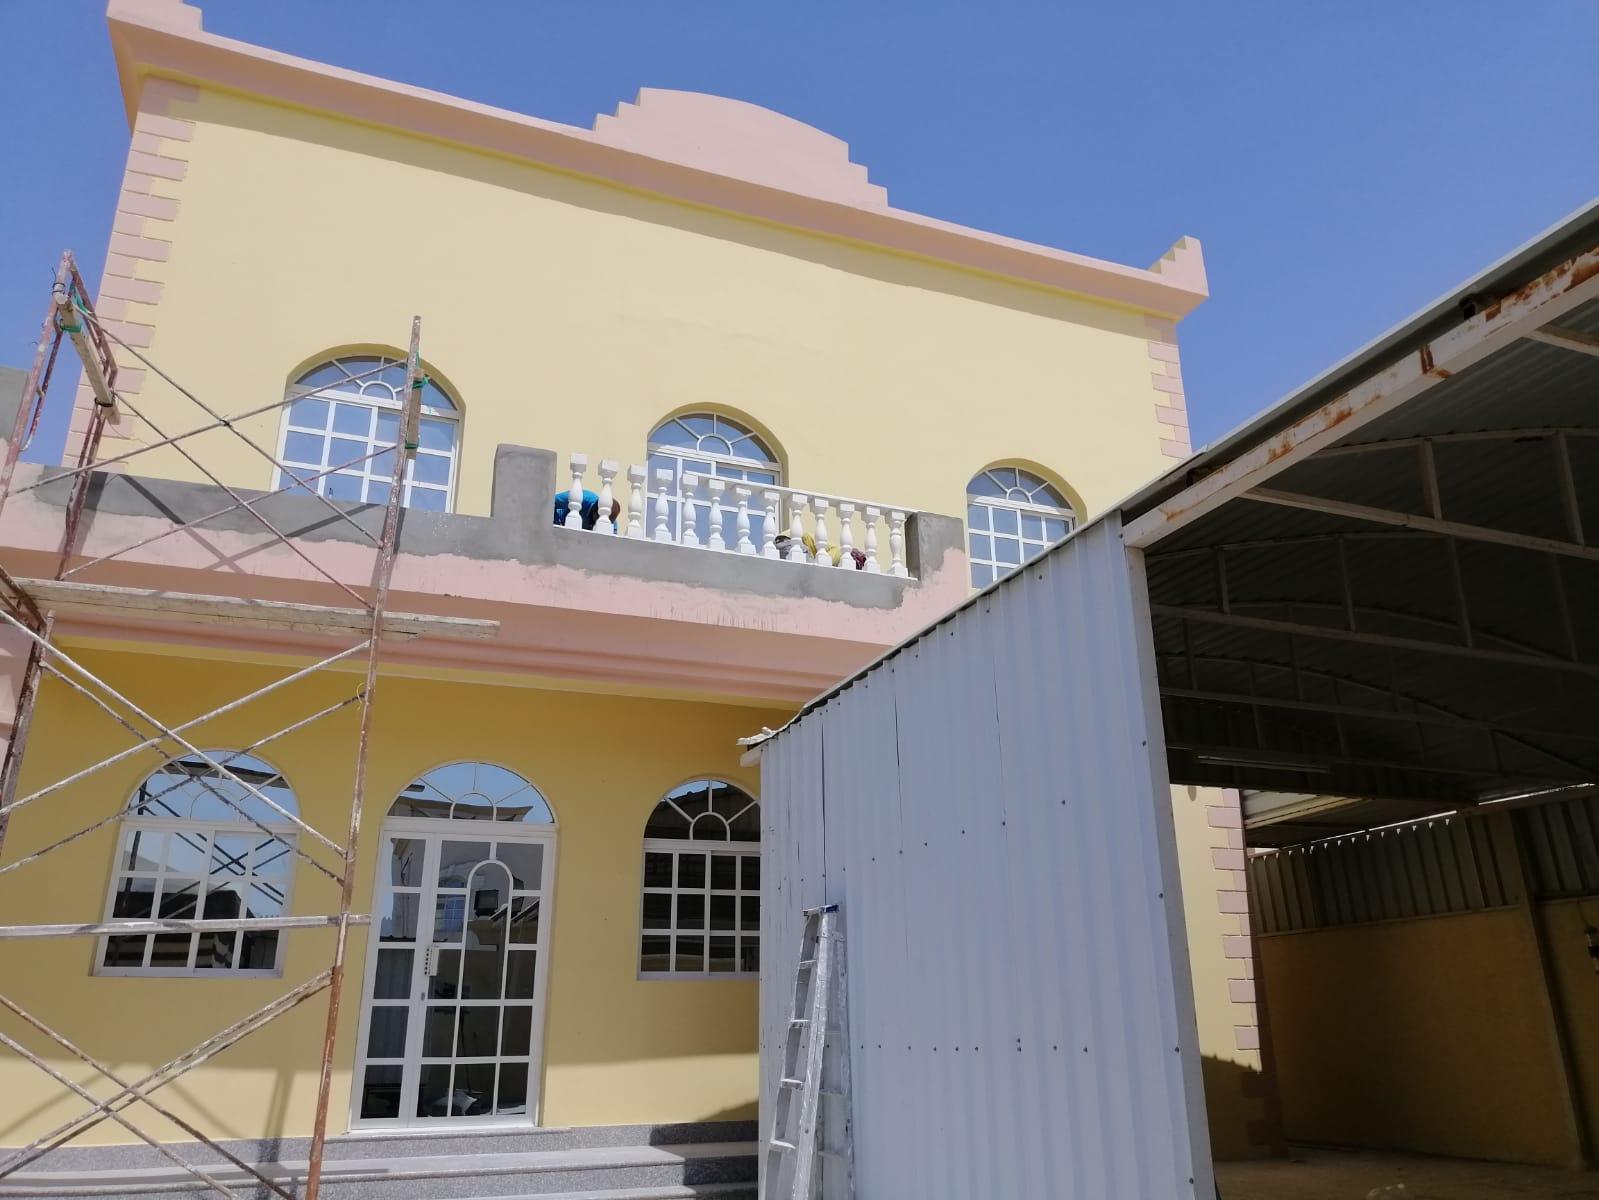 Maintenance works- Painting, Electrical, Plumbing,